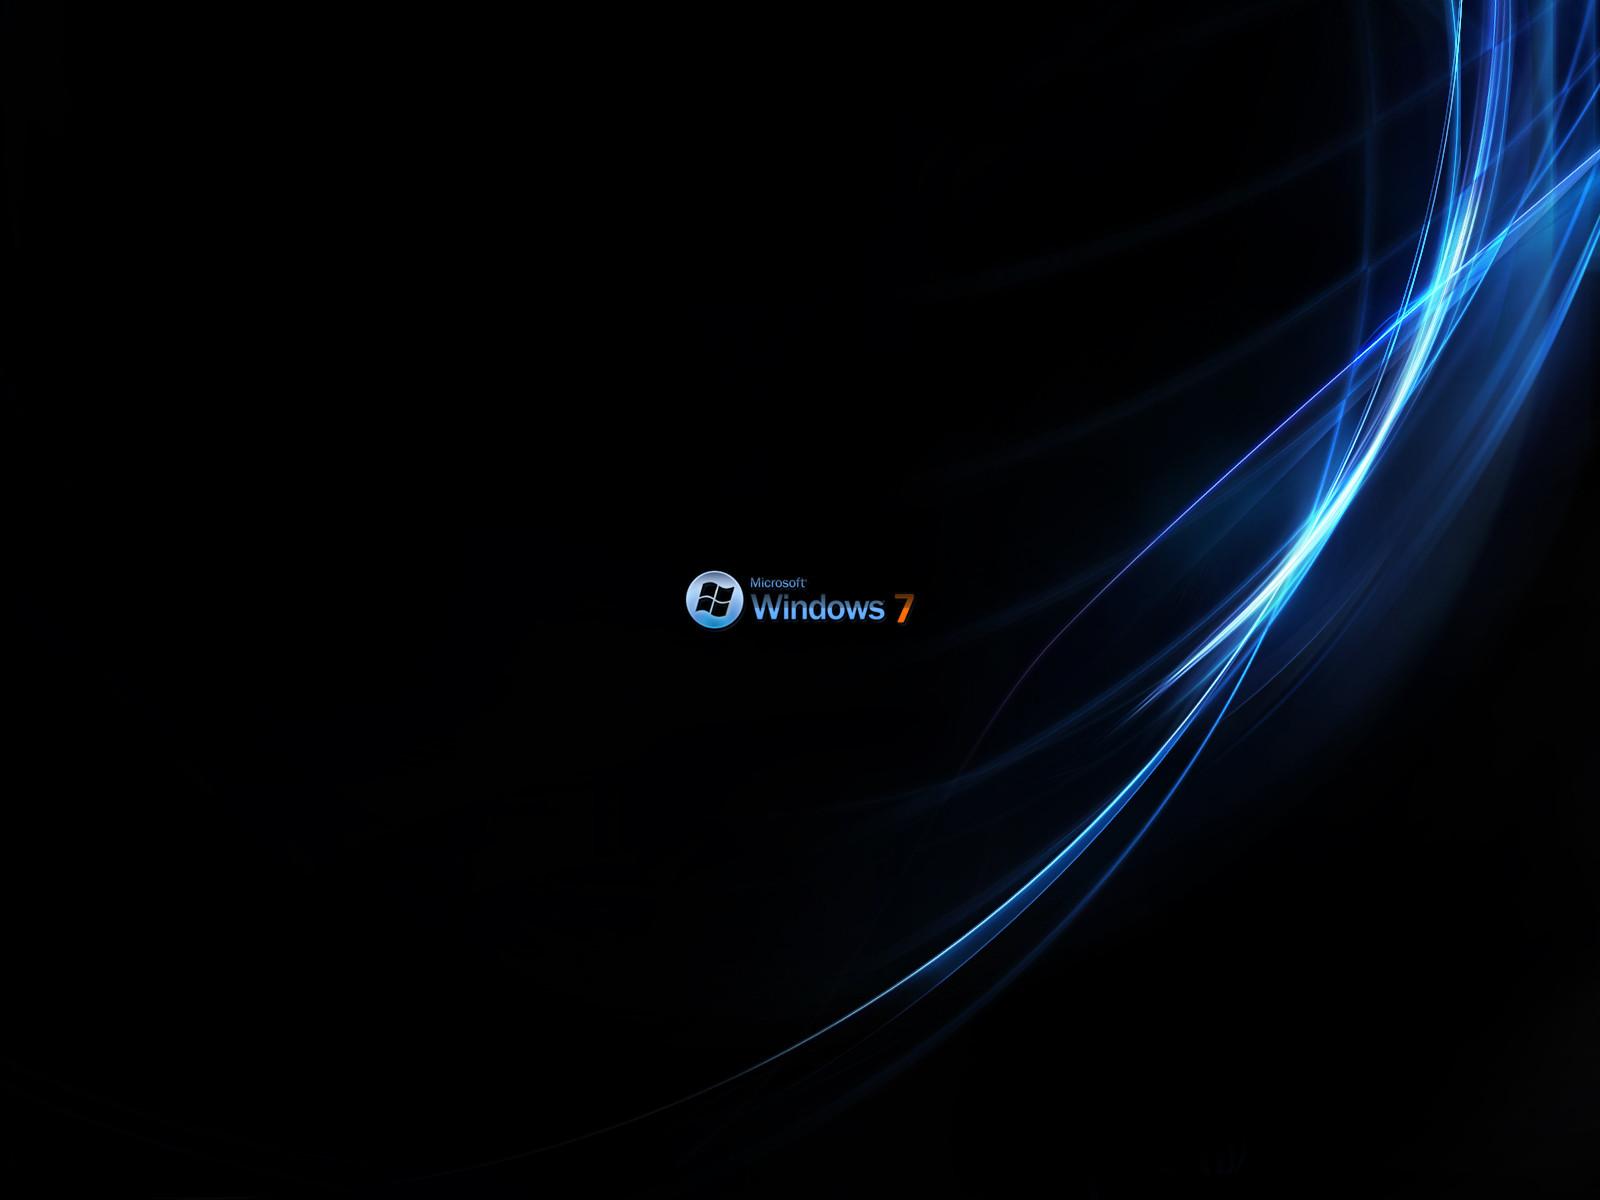 Windows 7 Wallpapers HD 1600x1200